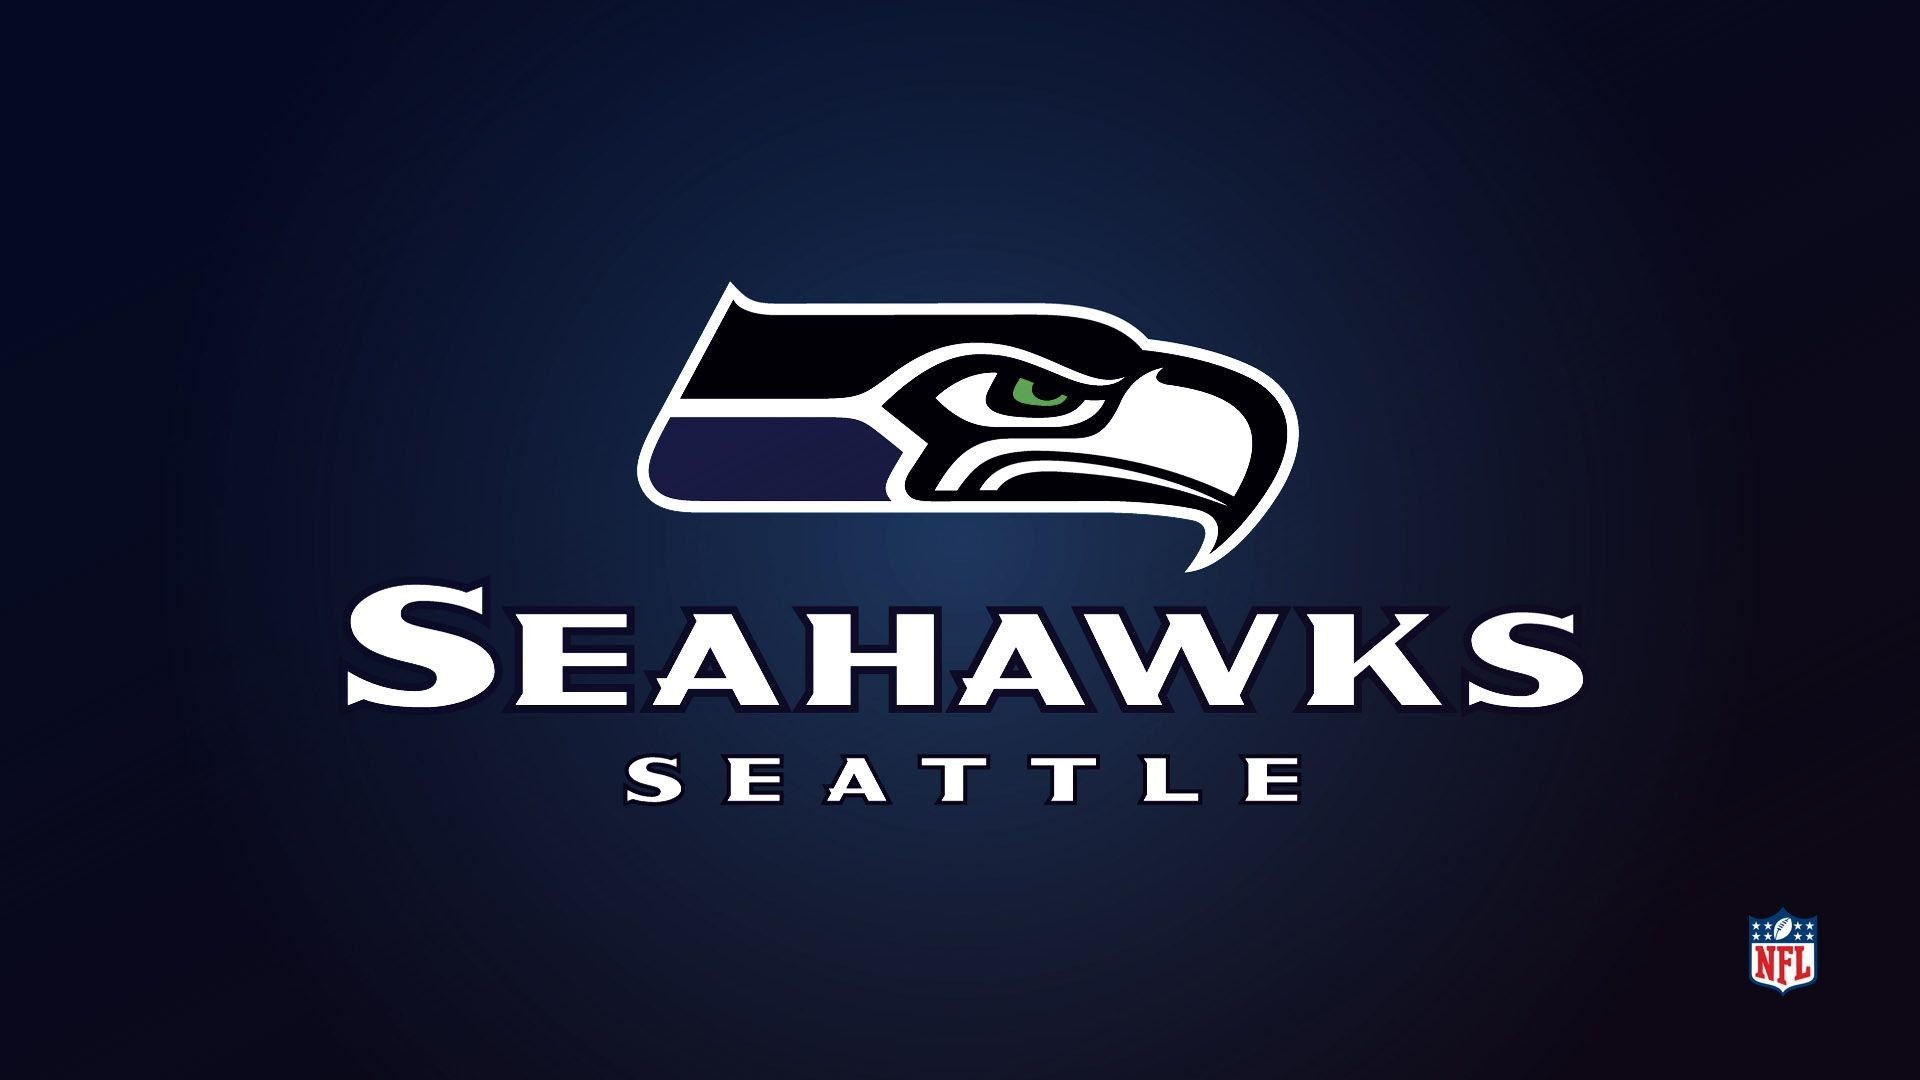 Seattle Seahawks Wallpapers – Wallpaper Cave